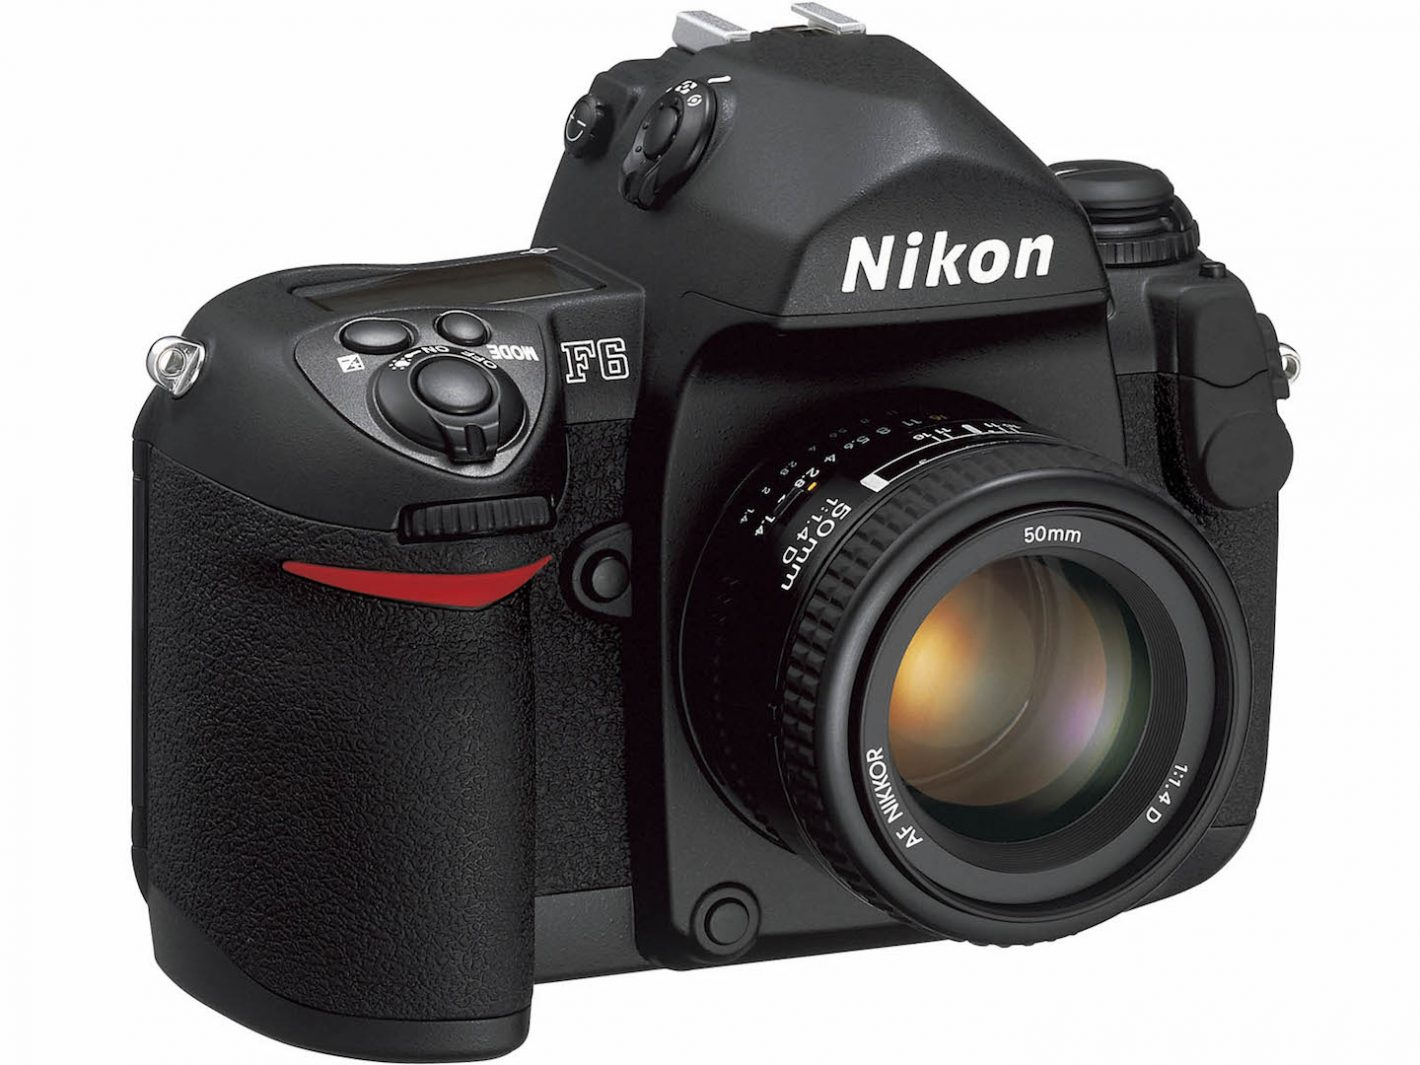 Boitiers Nikon F6 avec AF Nikkor 50mm 1.4 D